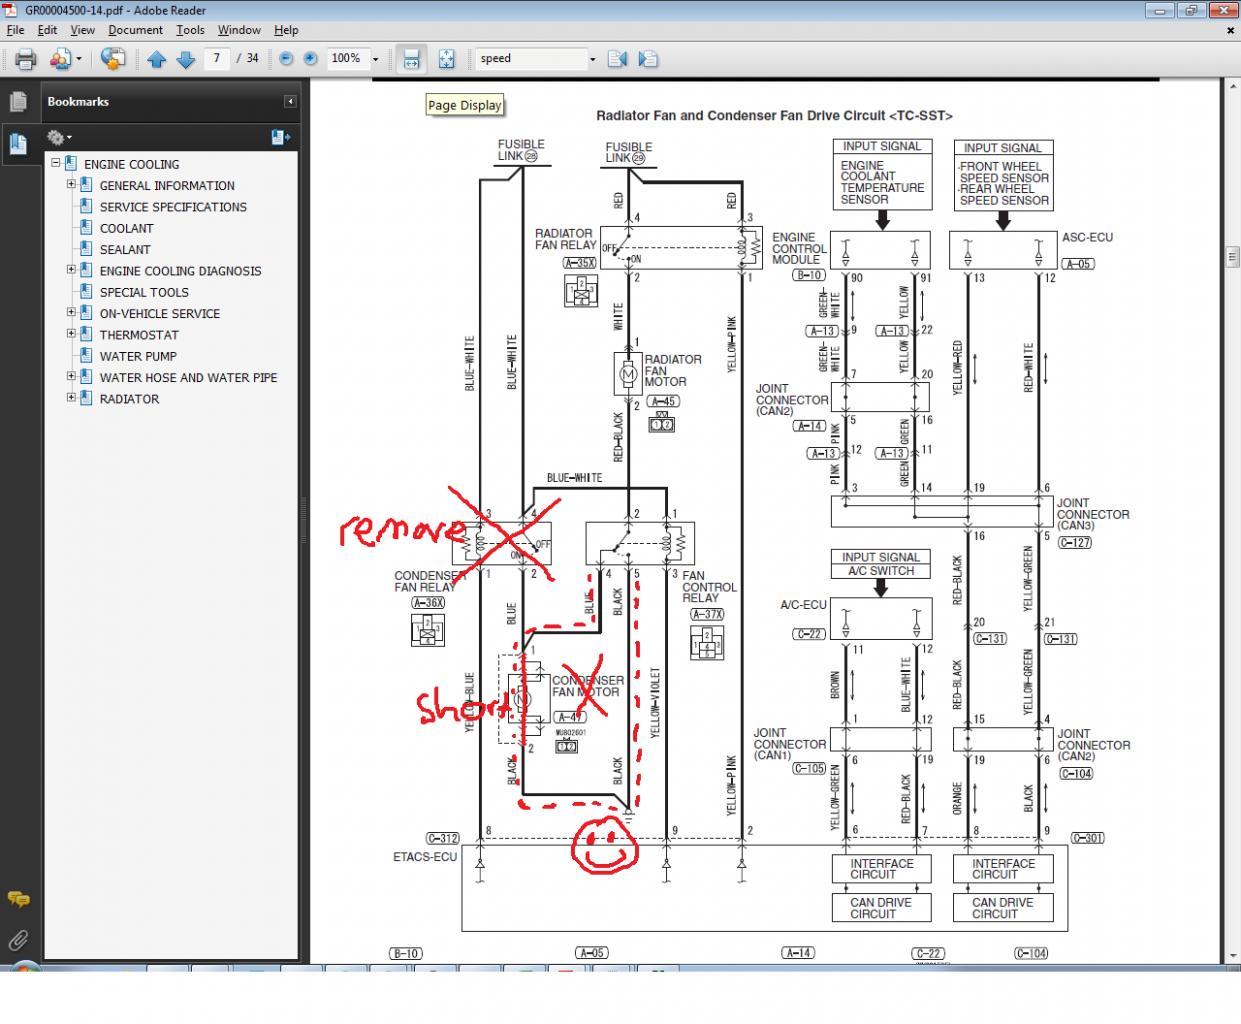 Evo x wiring diagram 7 mini cooper wiring harness chet cooling fan upgrade evoxforumscom mitsubishi lancer attachment showthreadphpt149594 evo x wiring diagram 7 evo x wiring diagram 7 asfbconference2016 Images